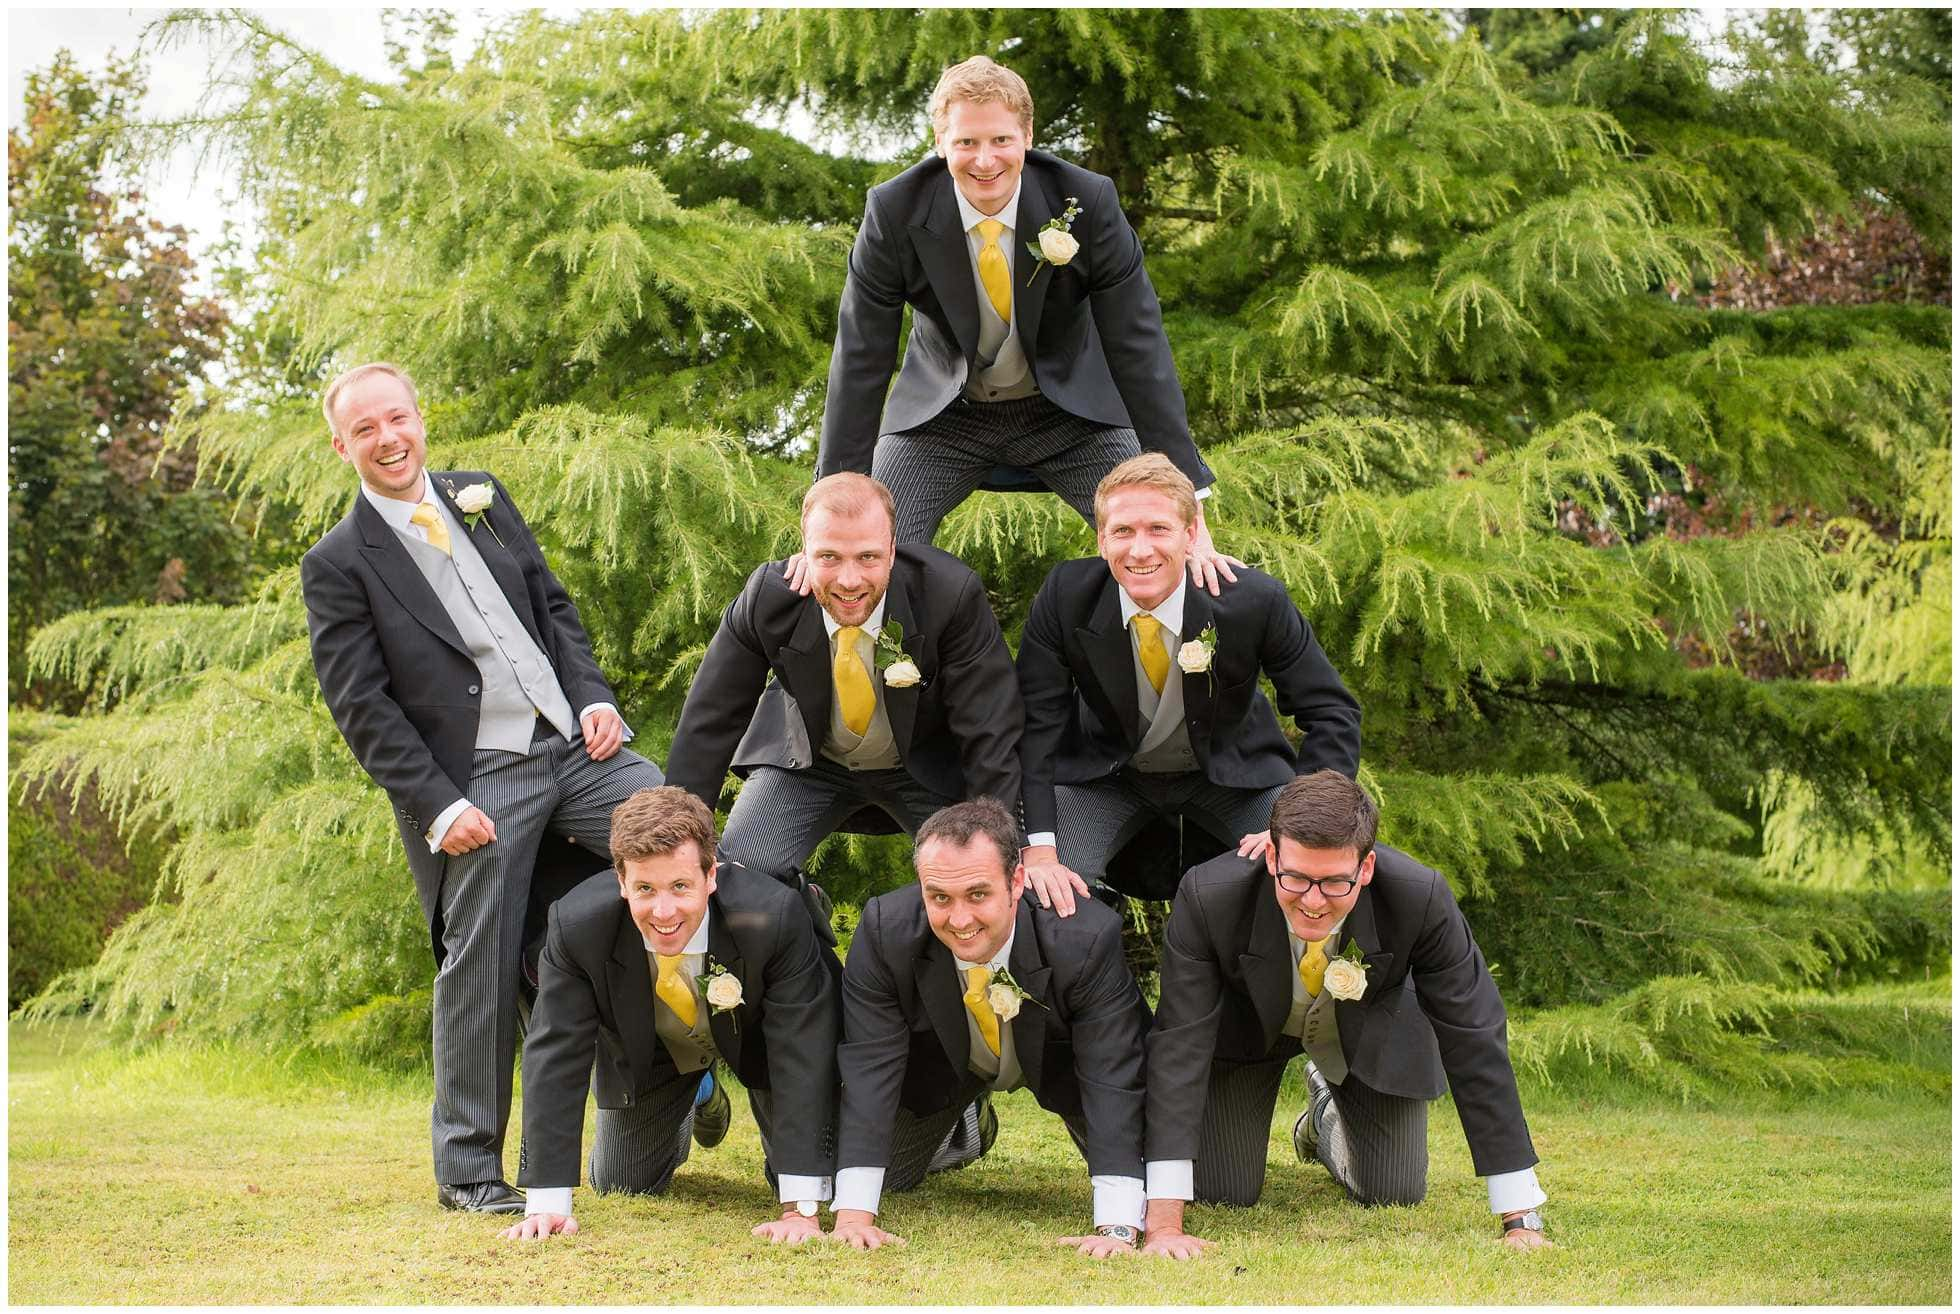 Human pyramid of groomsmen wedding photography